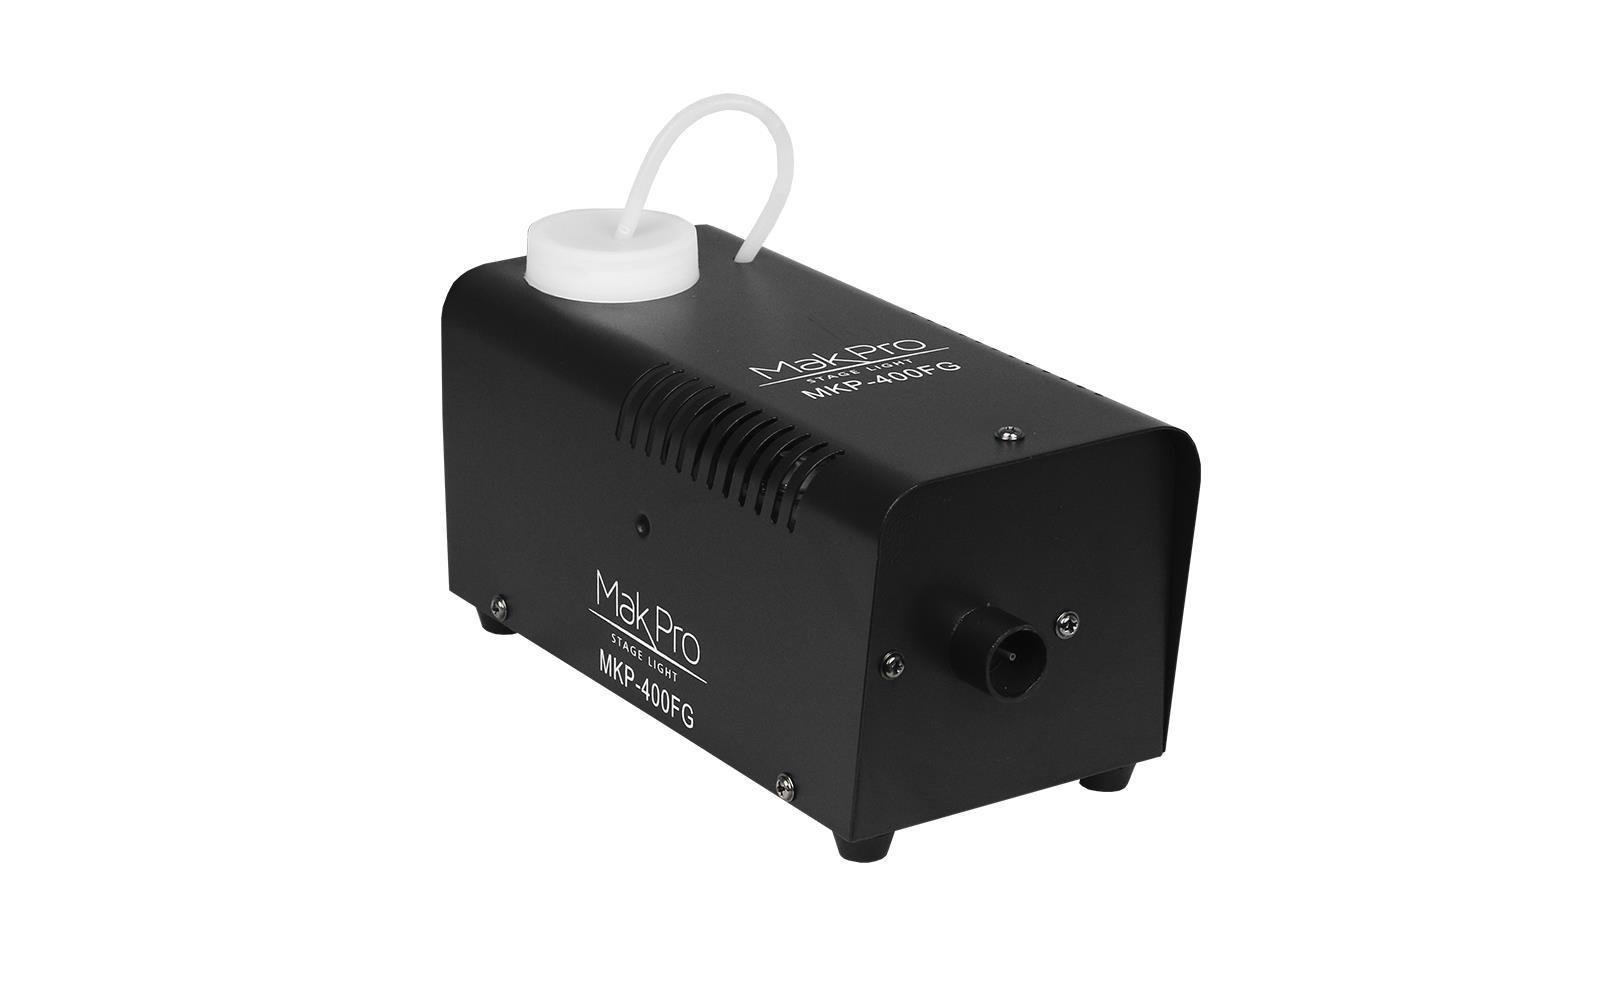 Mak Pro Máquina de Fumaça  400W MKP-400FG 220V Com Controle